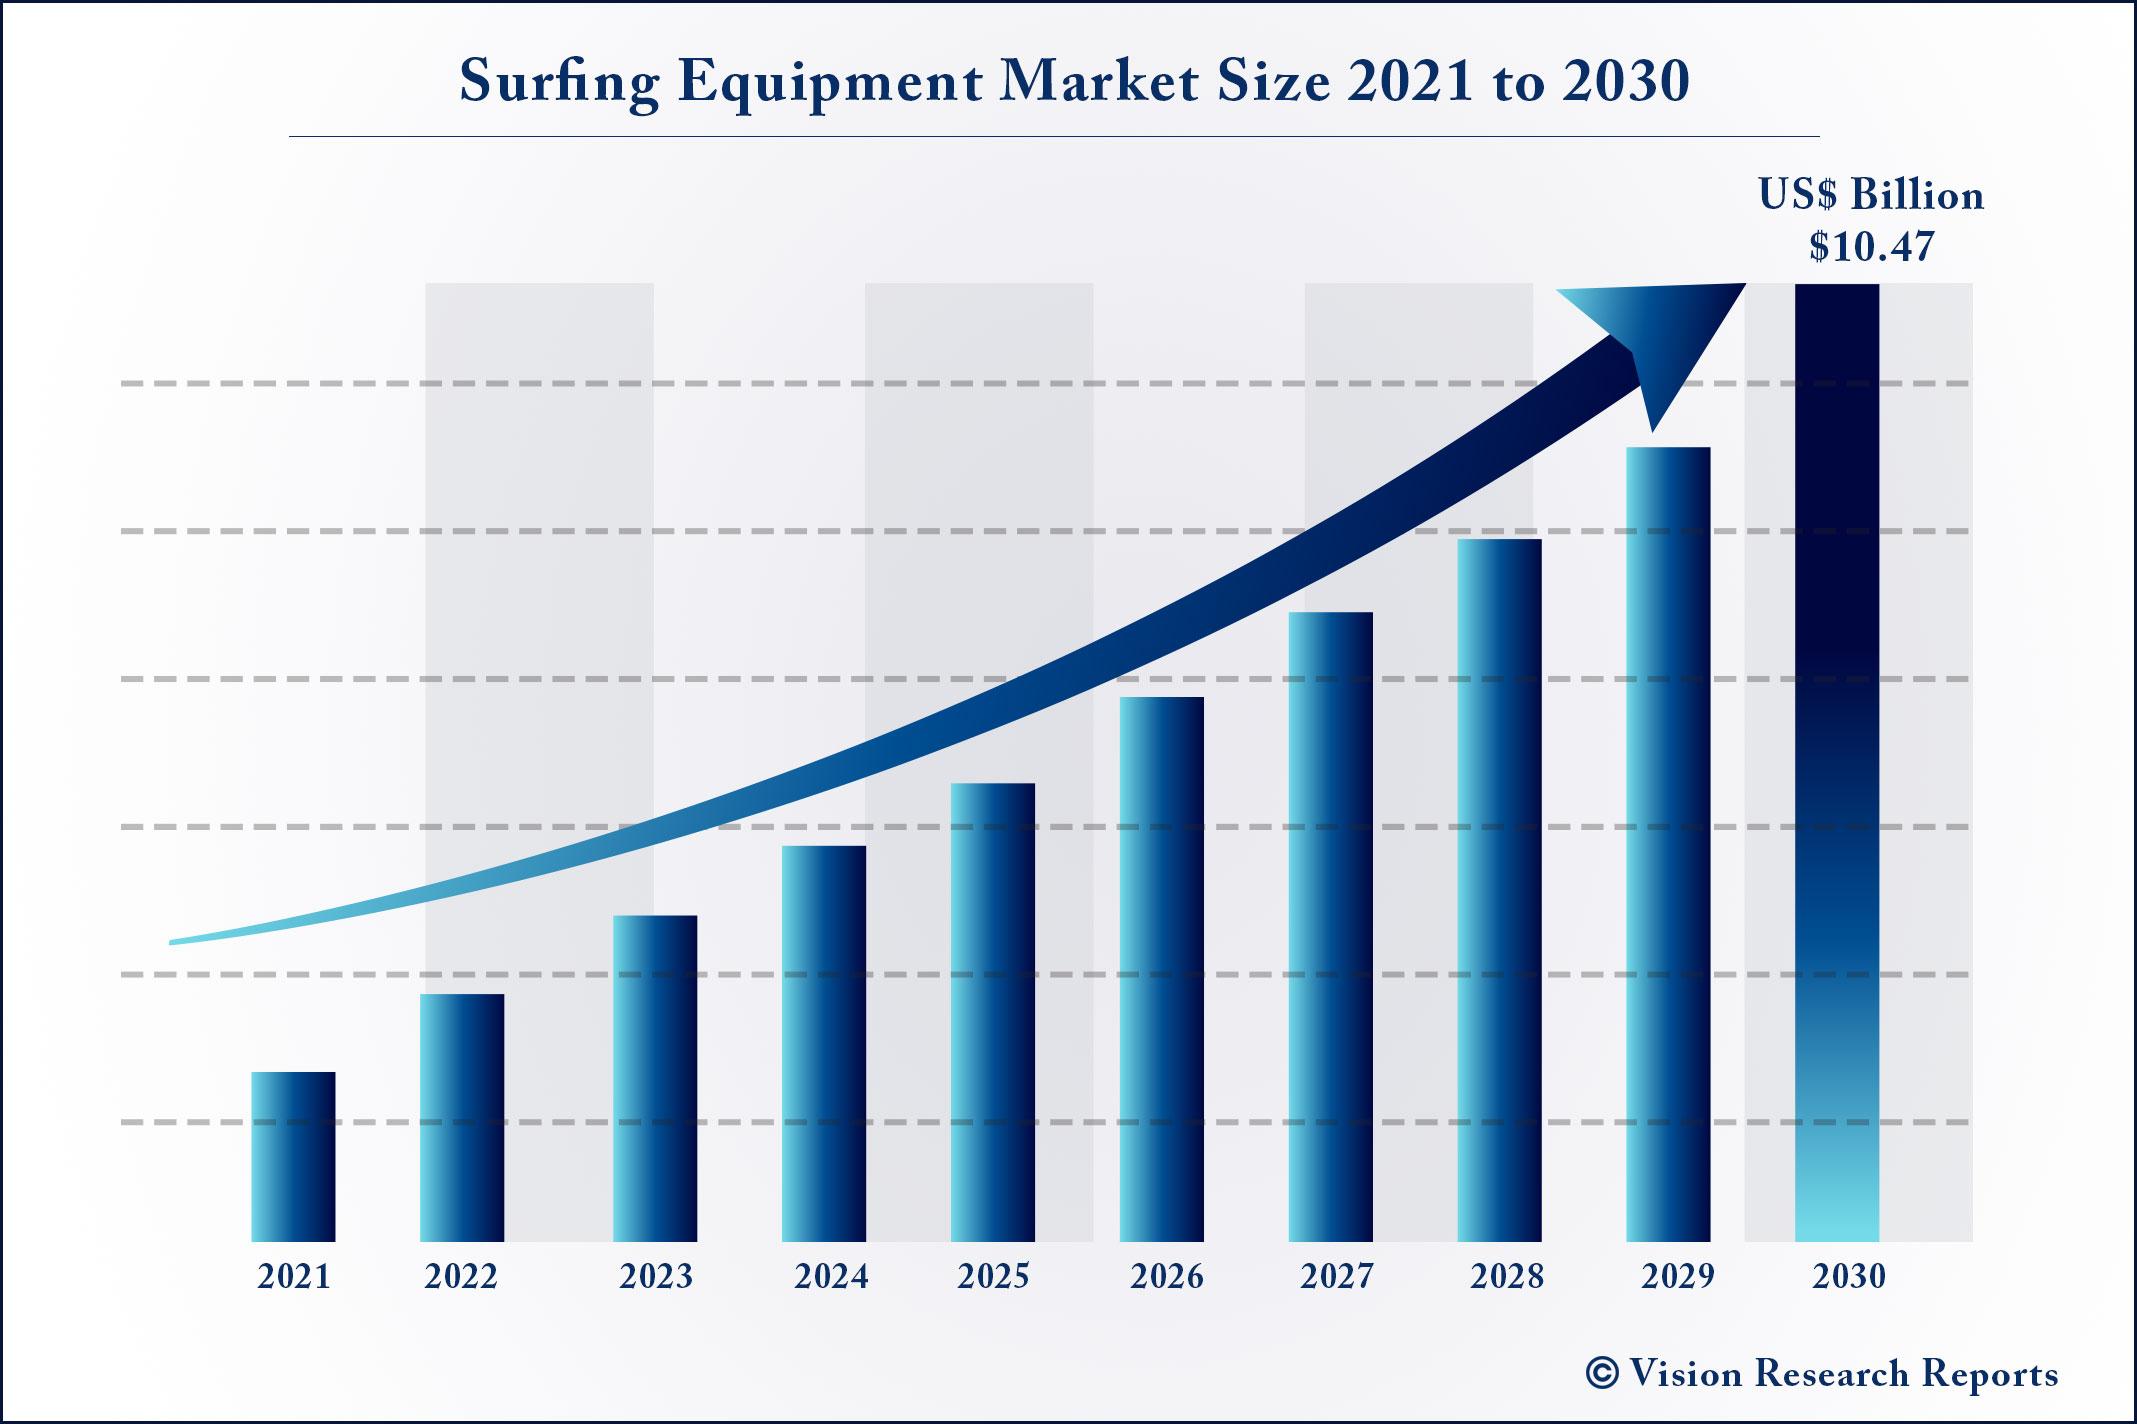 Surfing Equipment Market Size 2021 to 2030